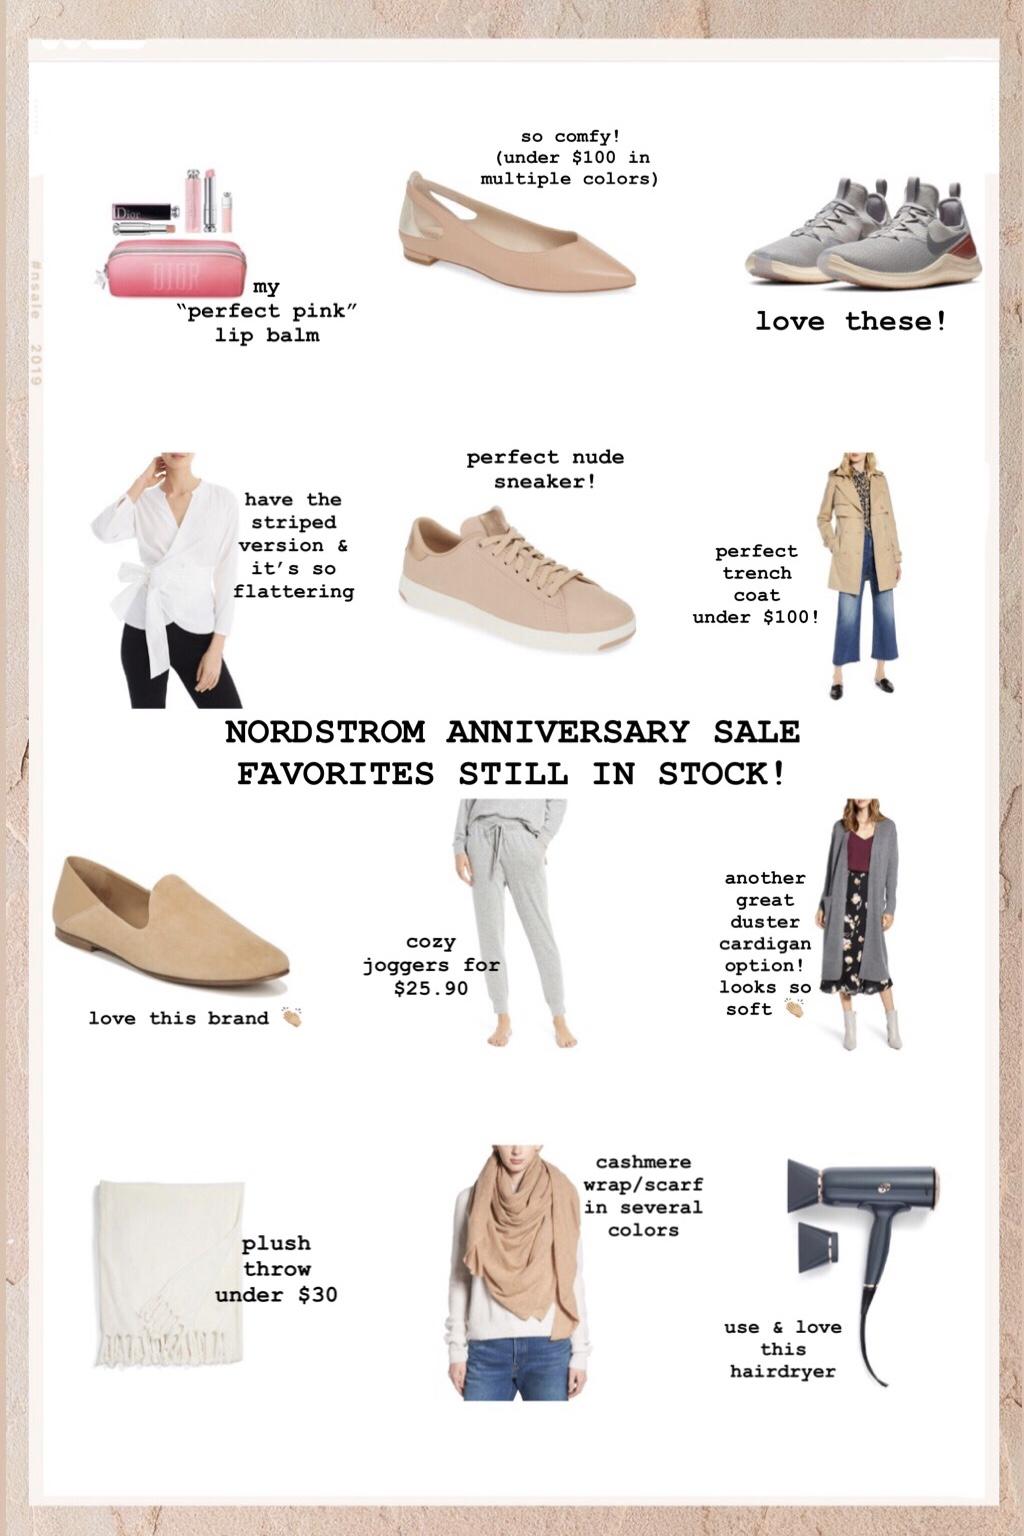 Nordstrom Anniversary Sale 2019 - Items Still in Stock! | www.girlmeetsgold.com